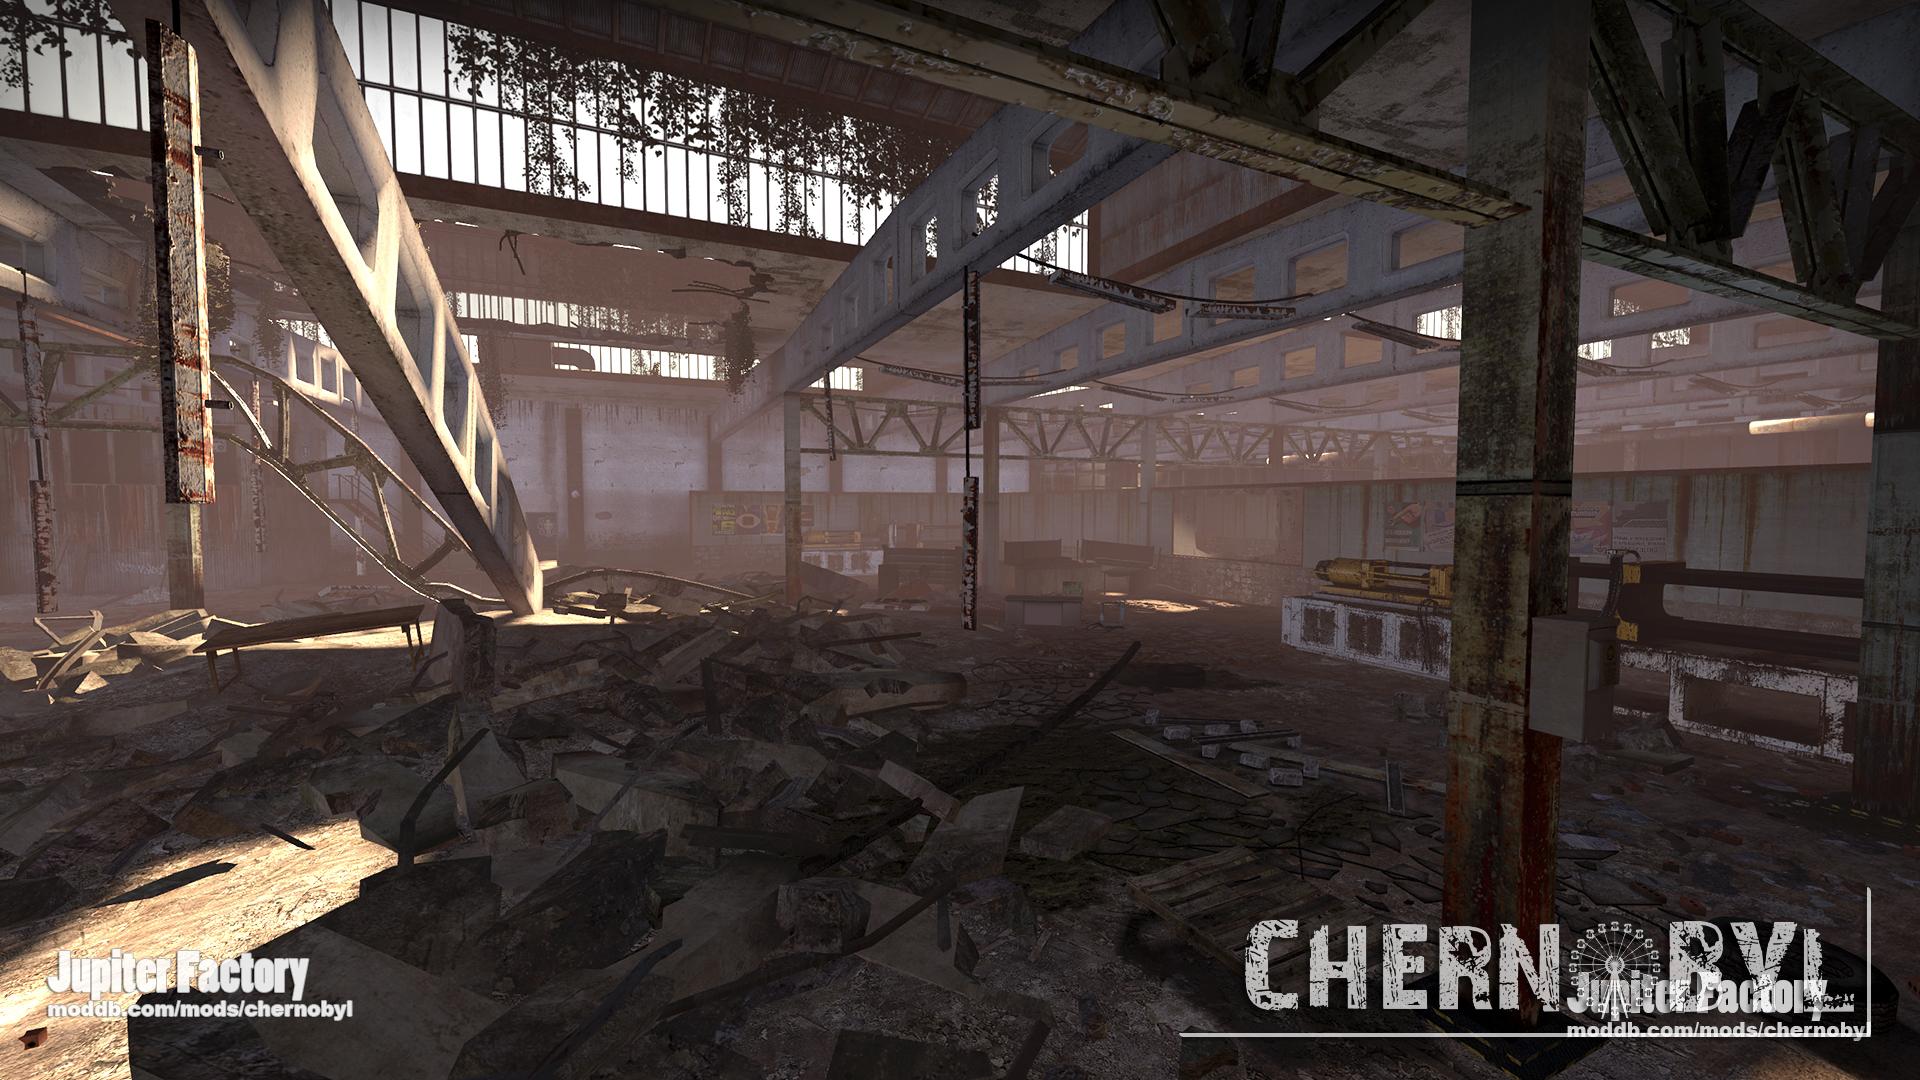 Jupiter Factory news - Chernobyl mod for Left 4 Dead 2 - Mod DB